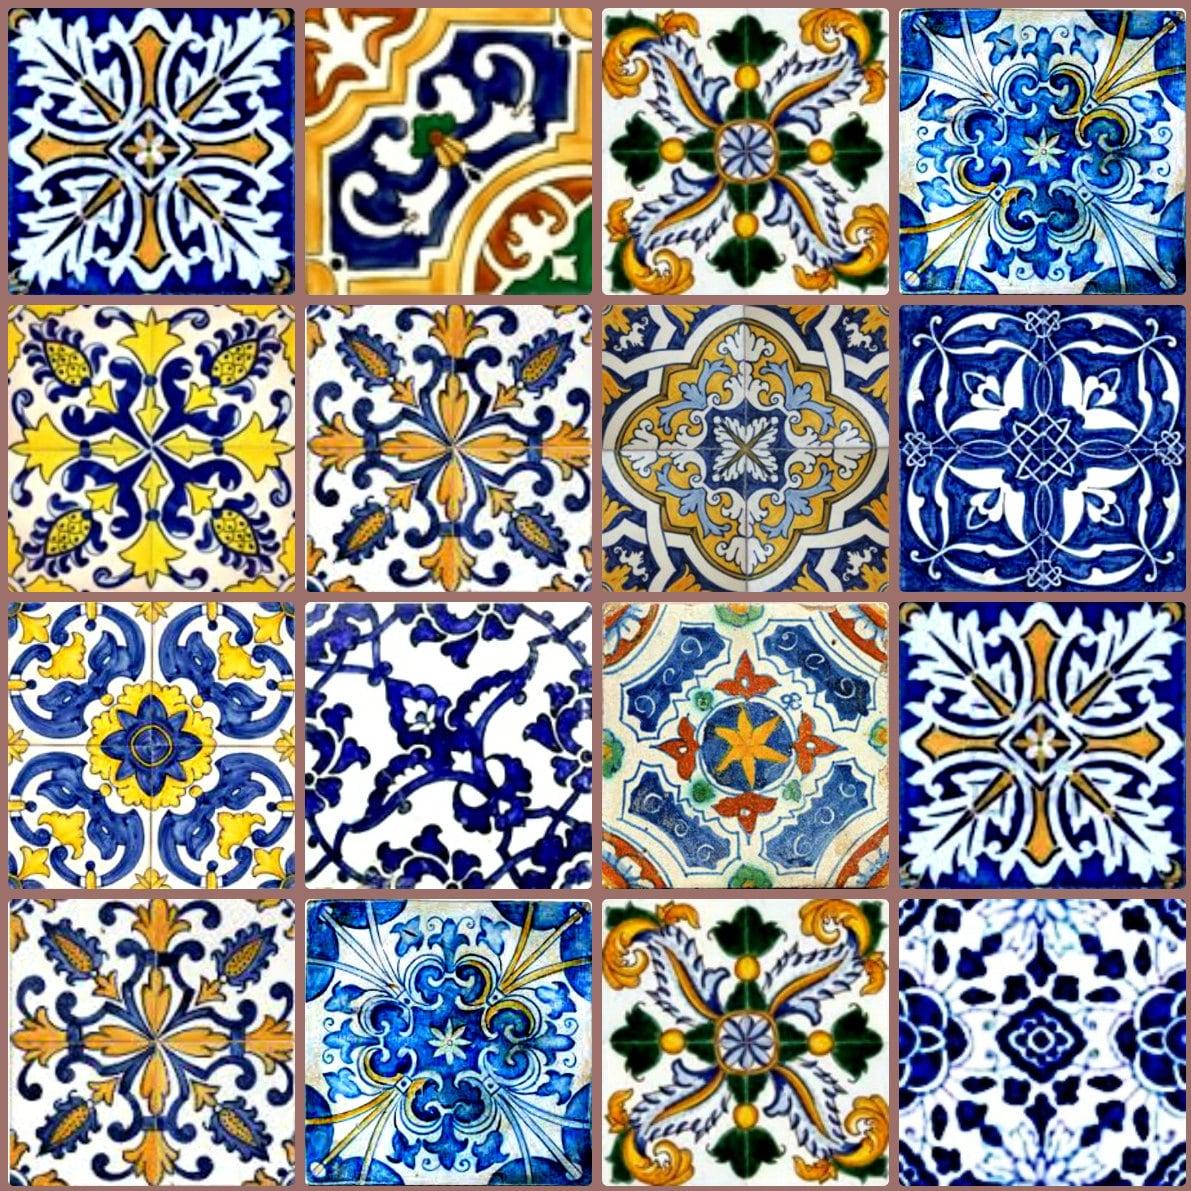 Miniature Dollhouse Tile Flooring: Dollhouse Miniature Ceramic Tile Spanish Talavera